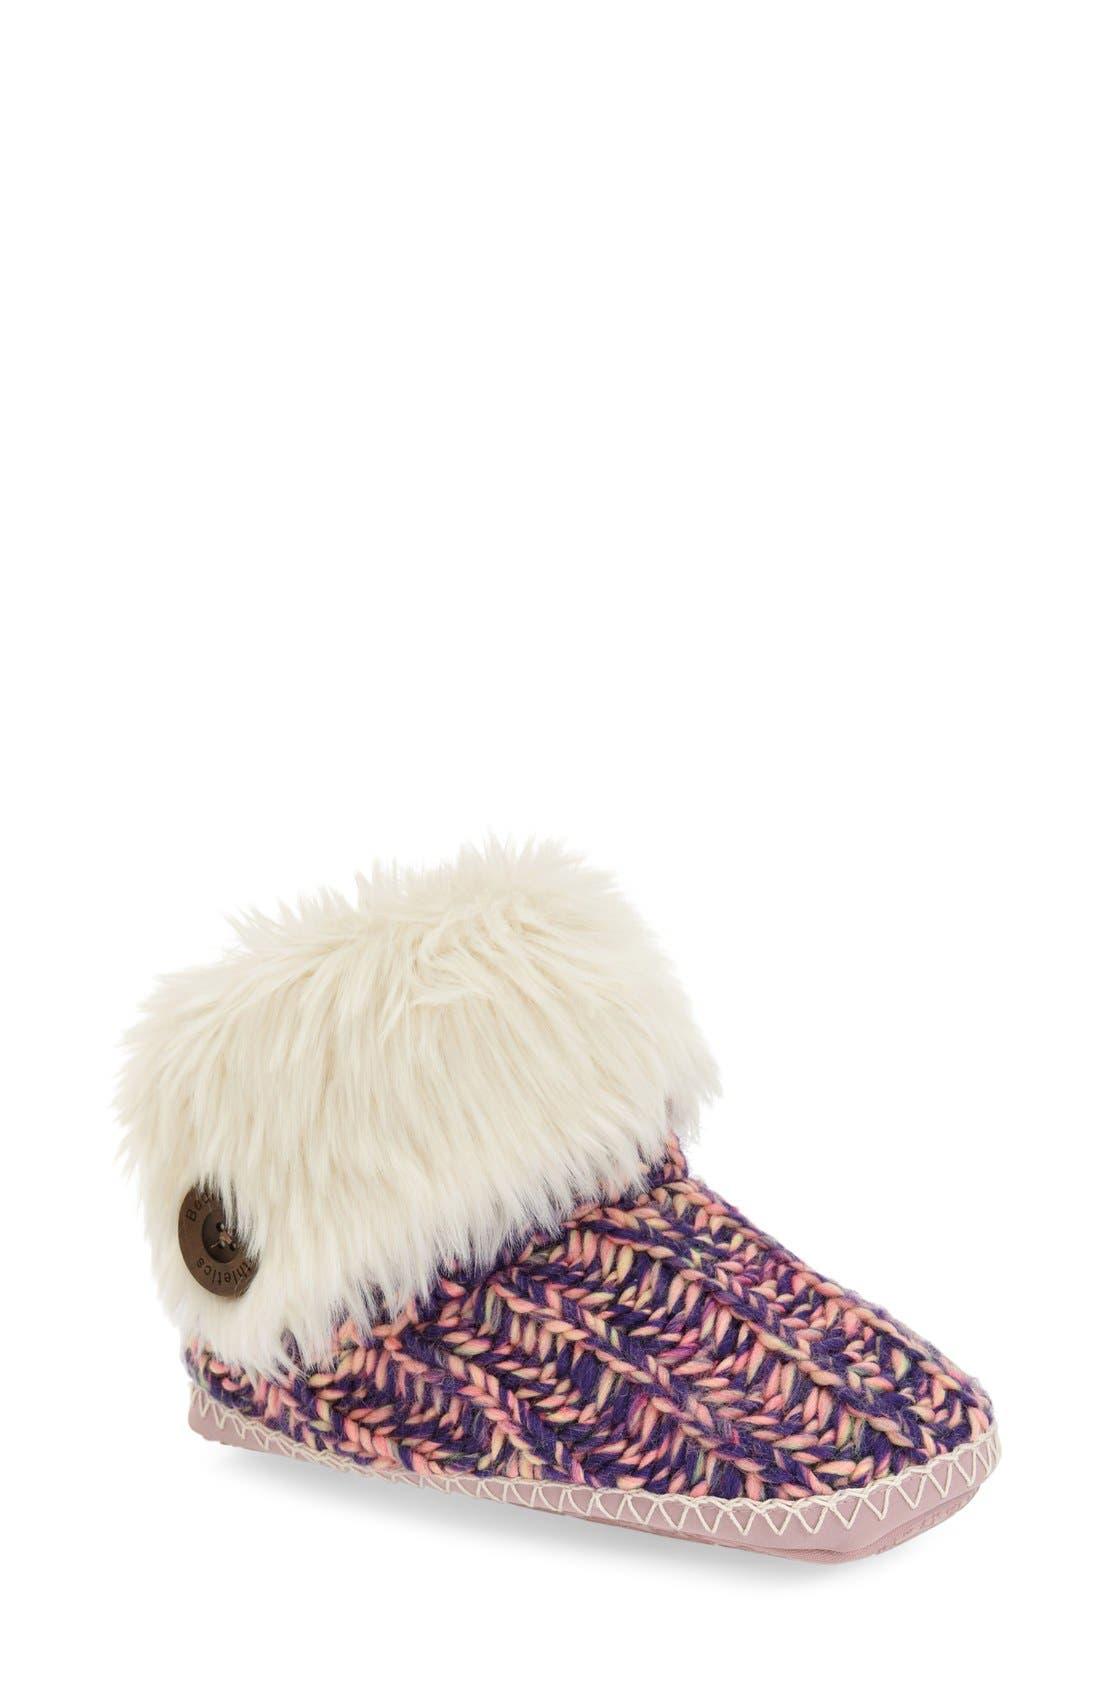 Main Image - Bedroom Athletics 'Toni' Faux Fur Knit Slipper Bootie (Women)